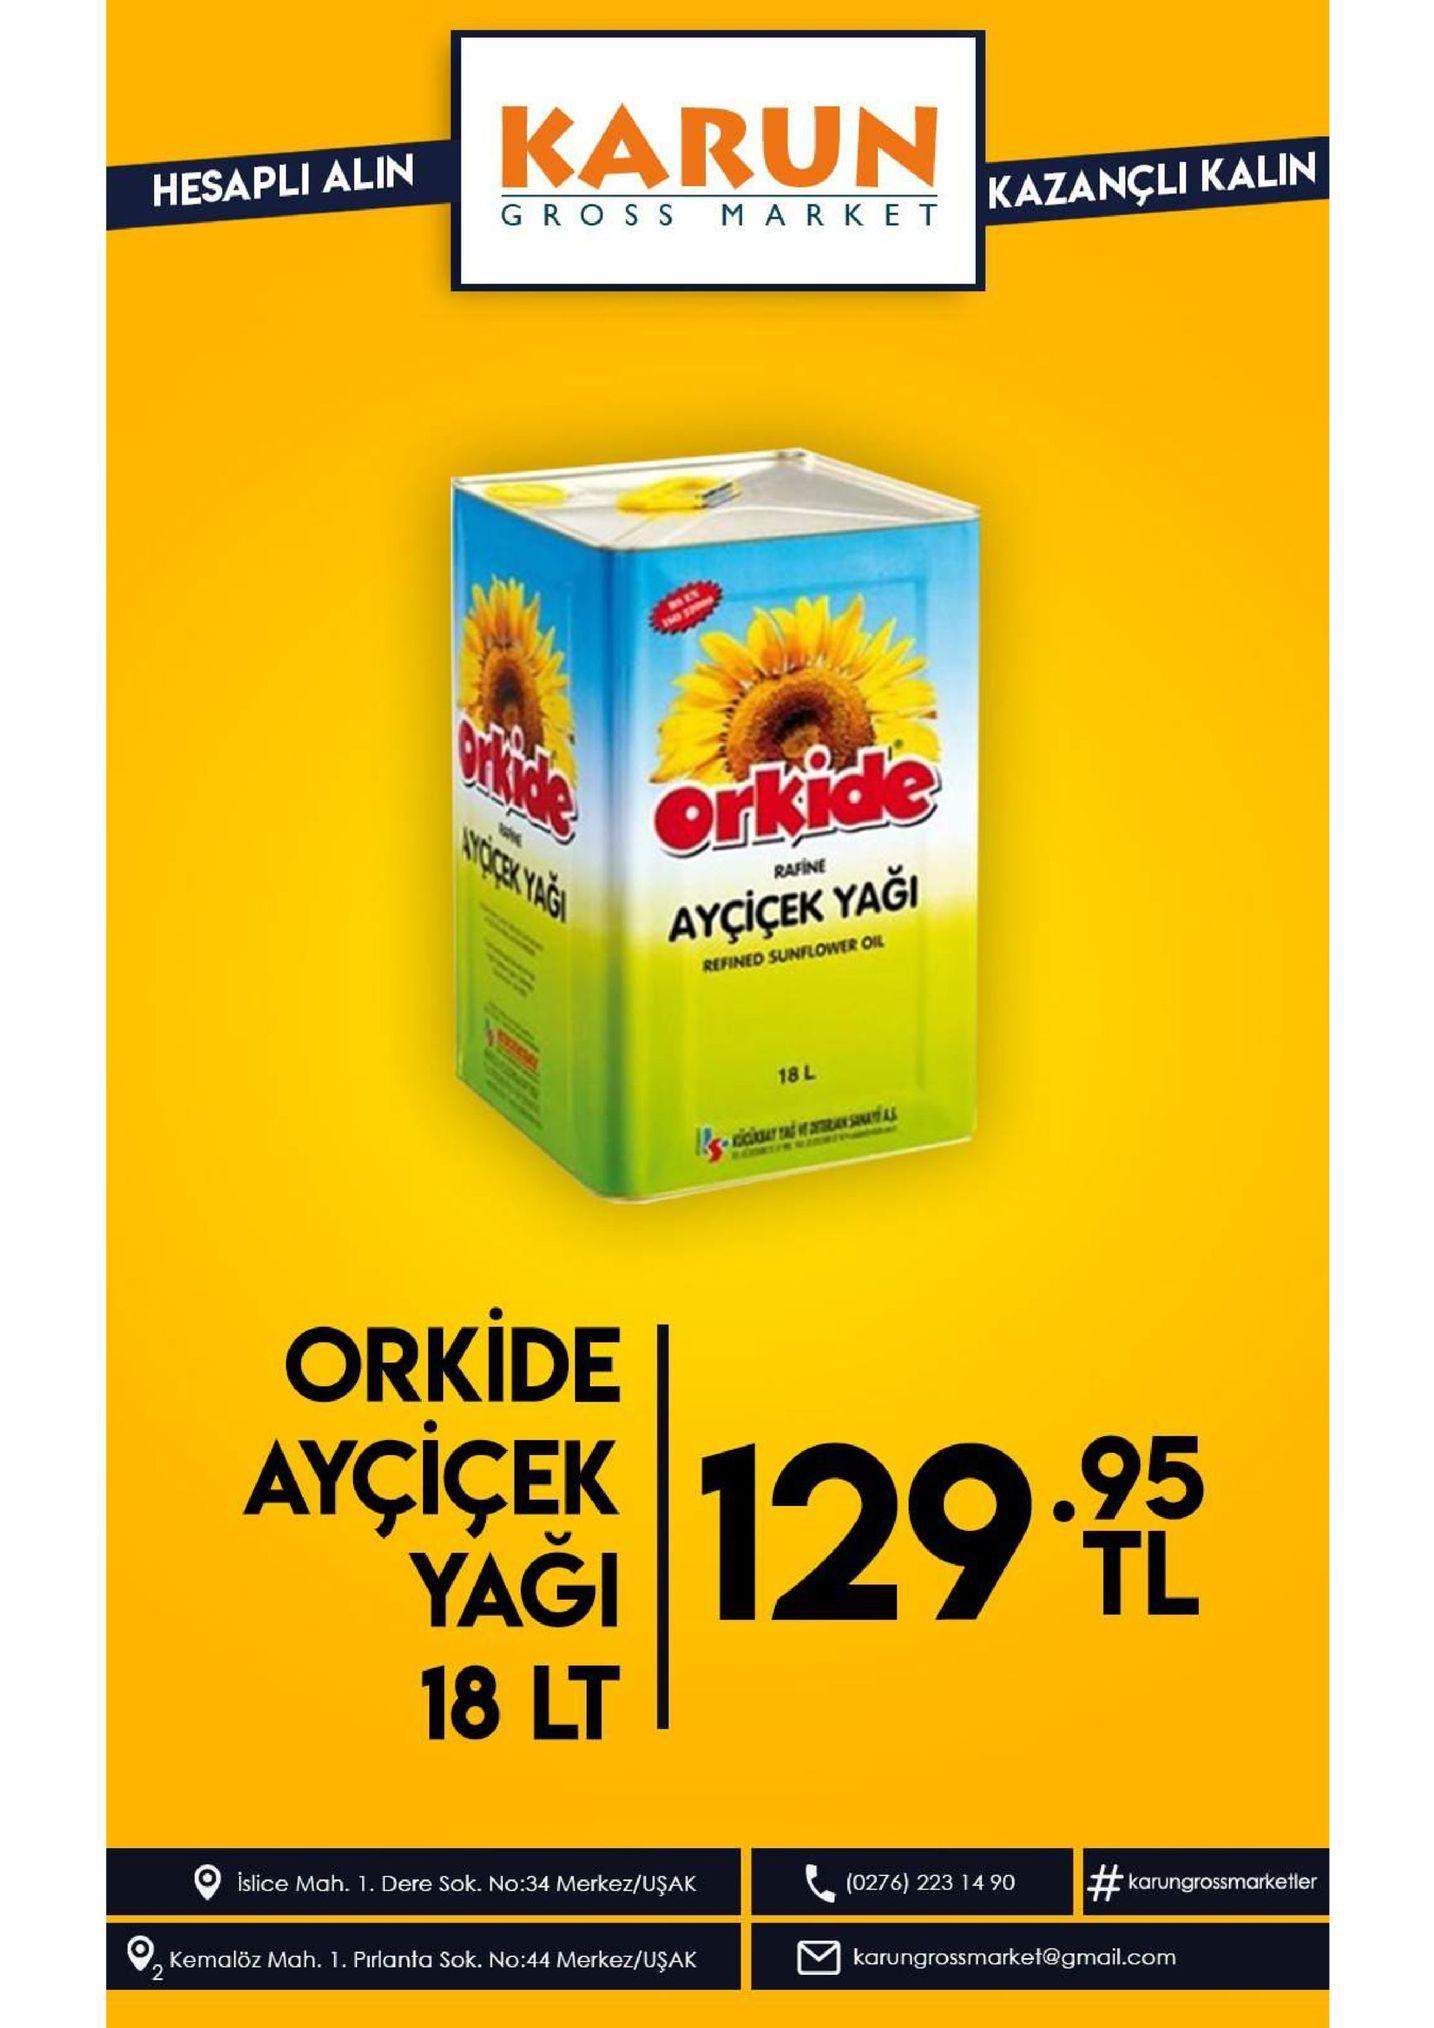 karun hesapli alin kazancli kalin gros s mark e t orkide arciax yagh rafine ayçiçek yaği refined sunflower oil 18 l orkide aycicek 129 l .95 yaği 18 lt islice mah. 1 dere sok. no:34 merkez/uşak #v (0276) 223 14 90 karungrossmarketler kemalöz mah. 1. pirlanta sok. no:44 merkez/uşak karungrossmarket@gmail.com 2